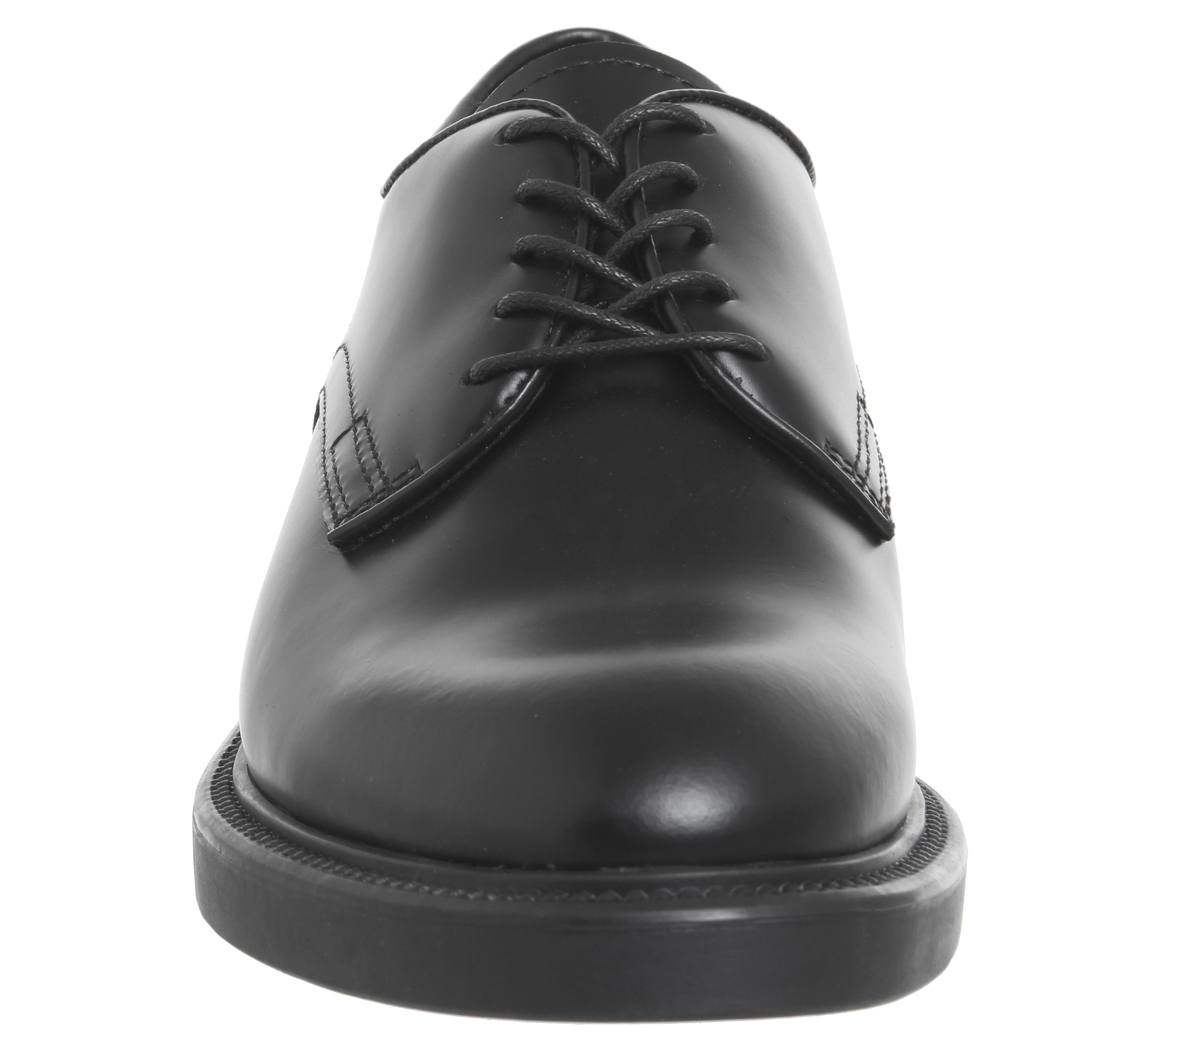 Flats nera pelle Vagabond in Alex W Donna F8tqZP